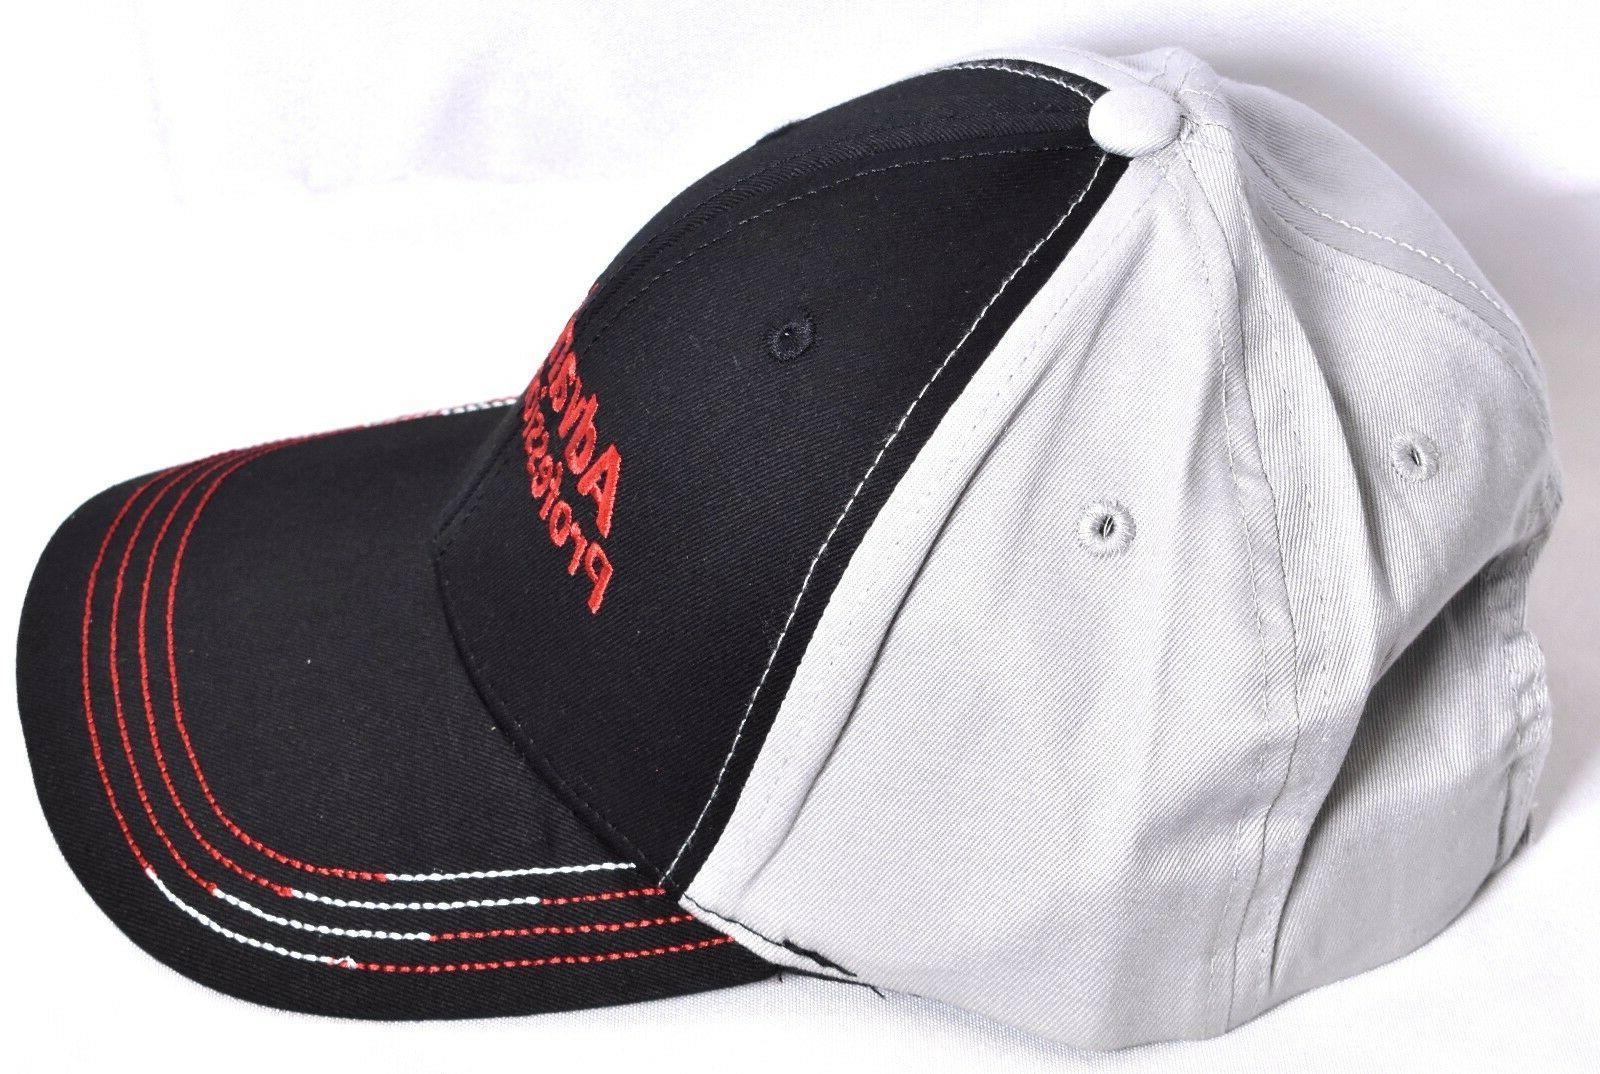 ADVANCE PROFESSIONAL Black & Gray Baseball Hat/Cap Adjustable